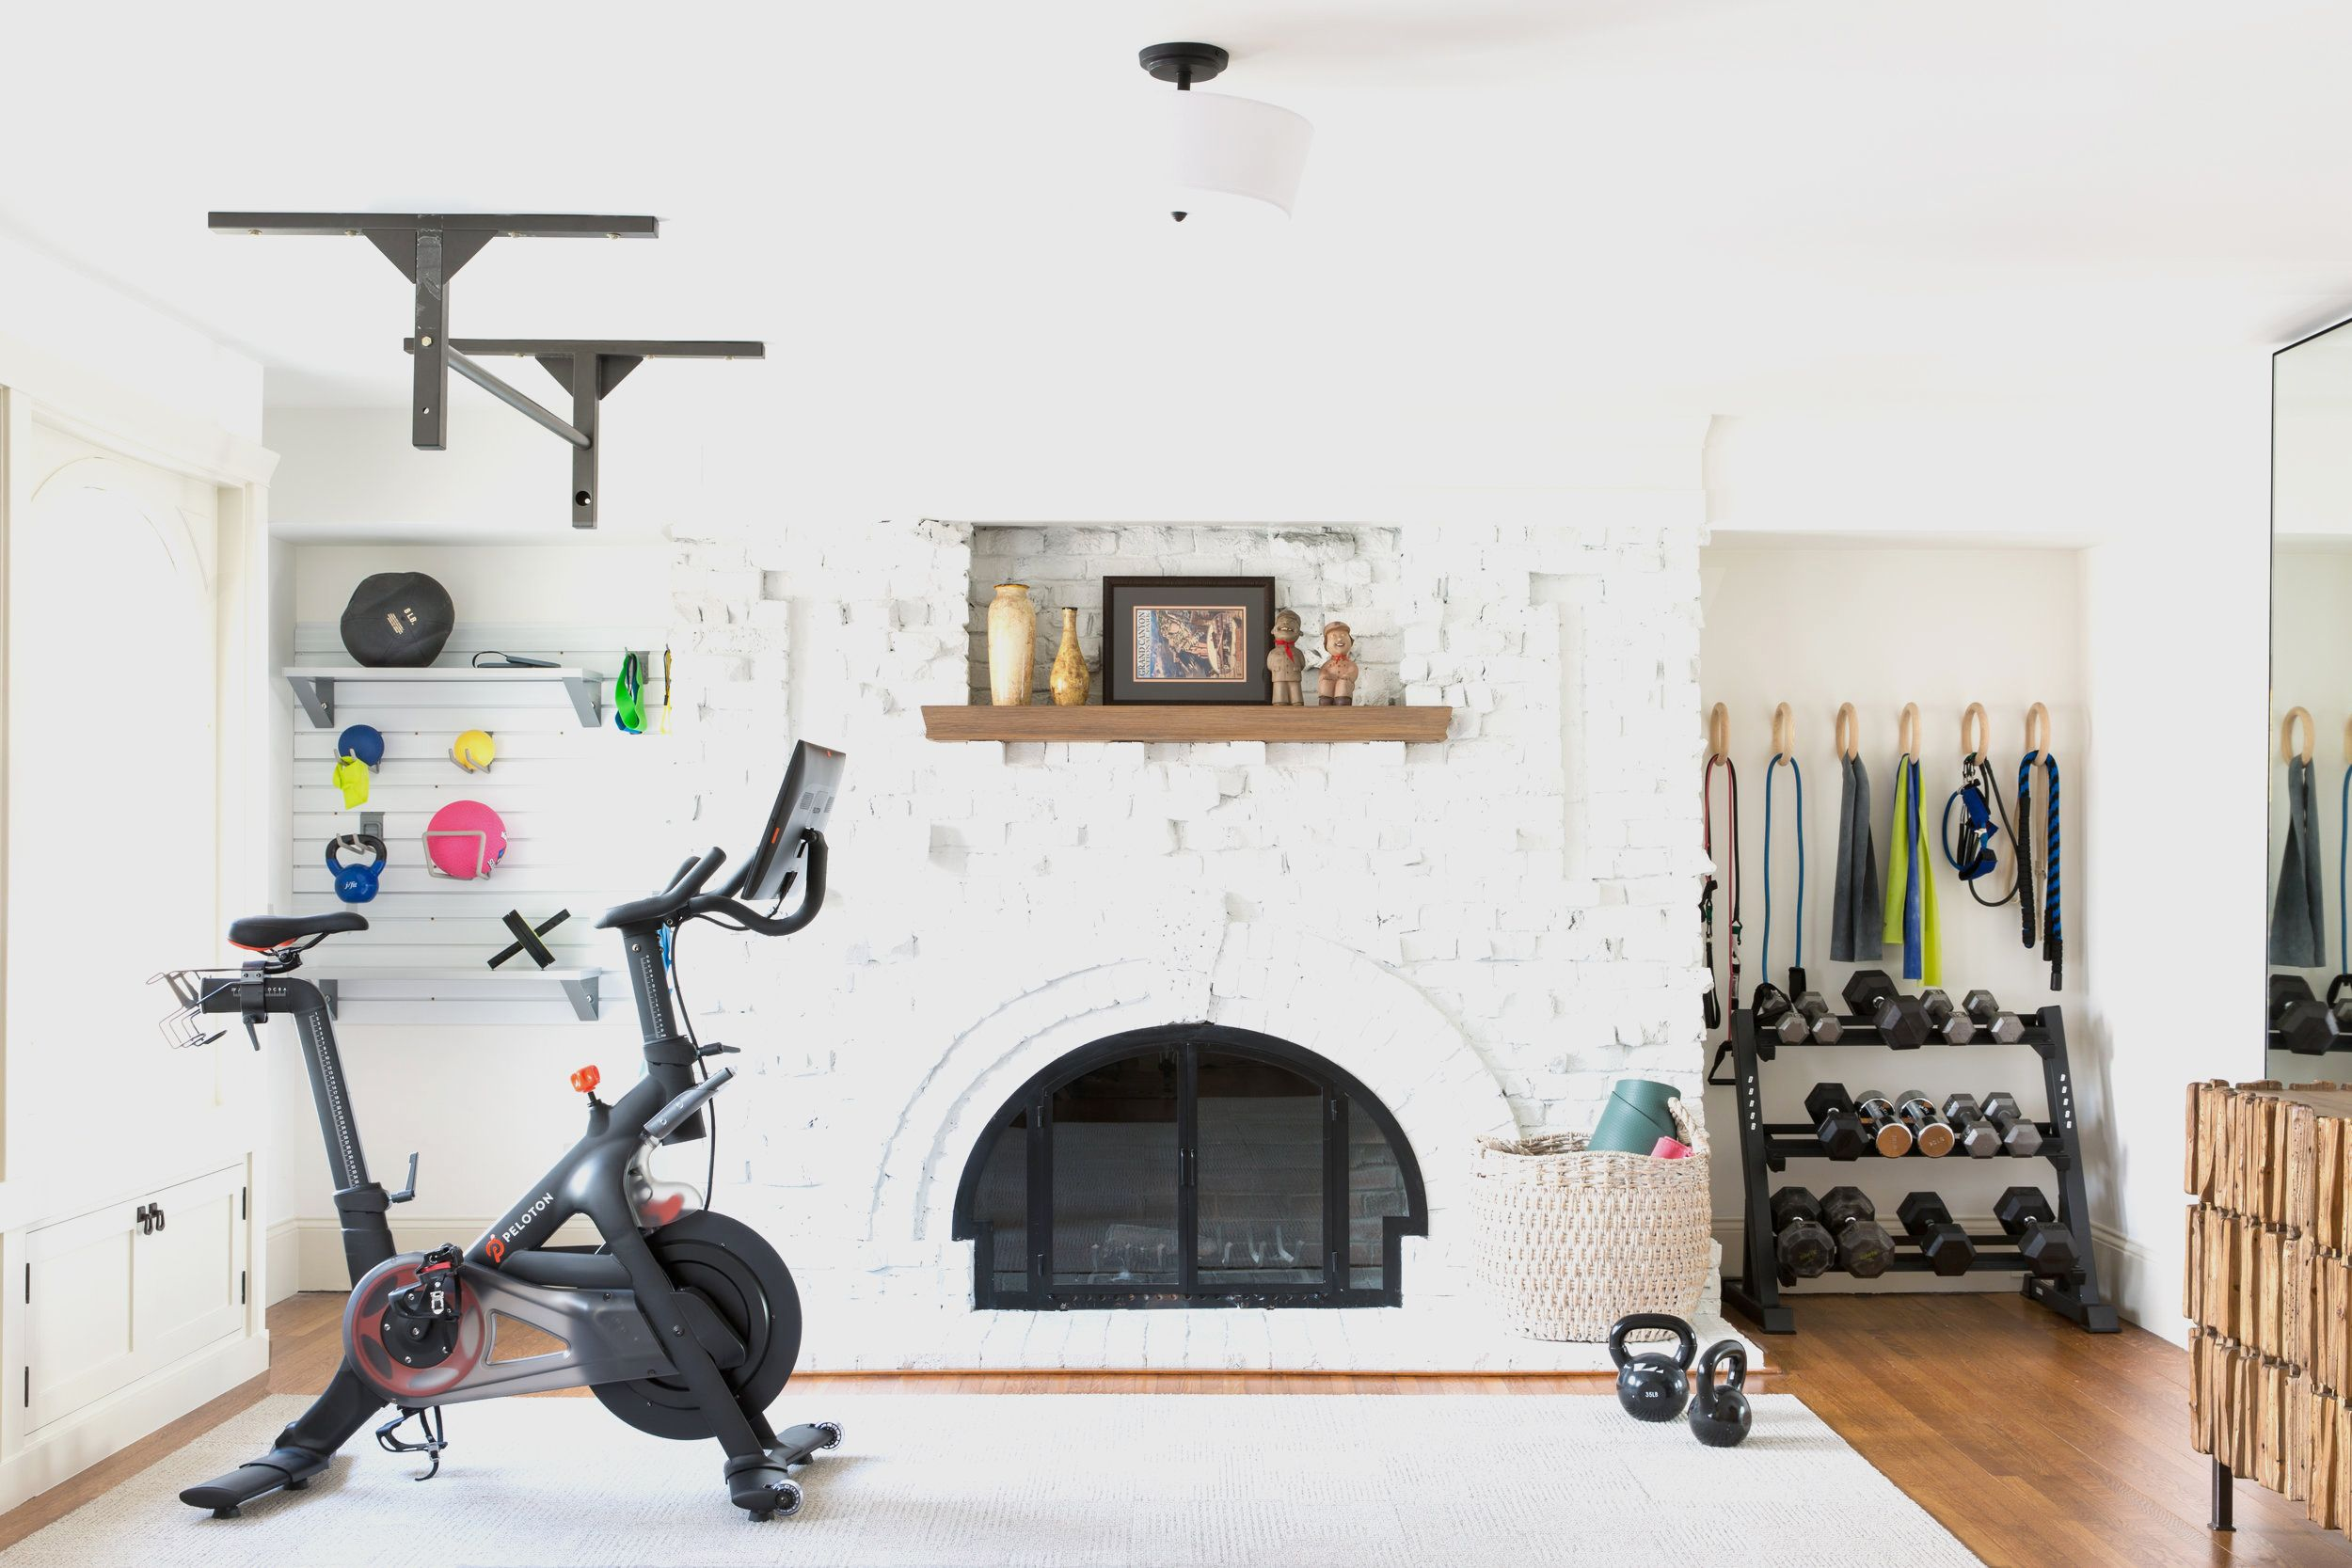 15 Best Home Gym Ideas In 2020 Home Gym Design